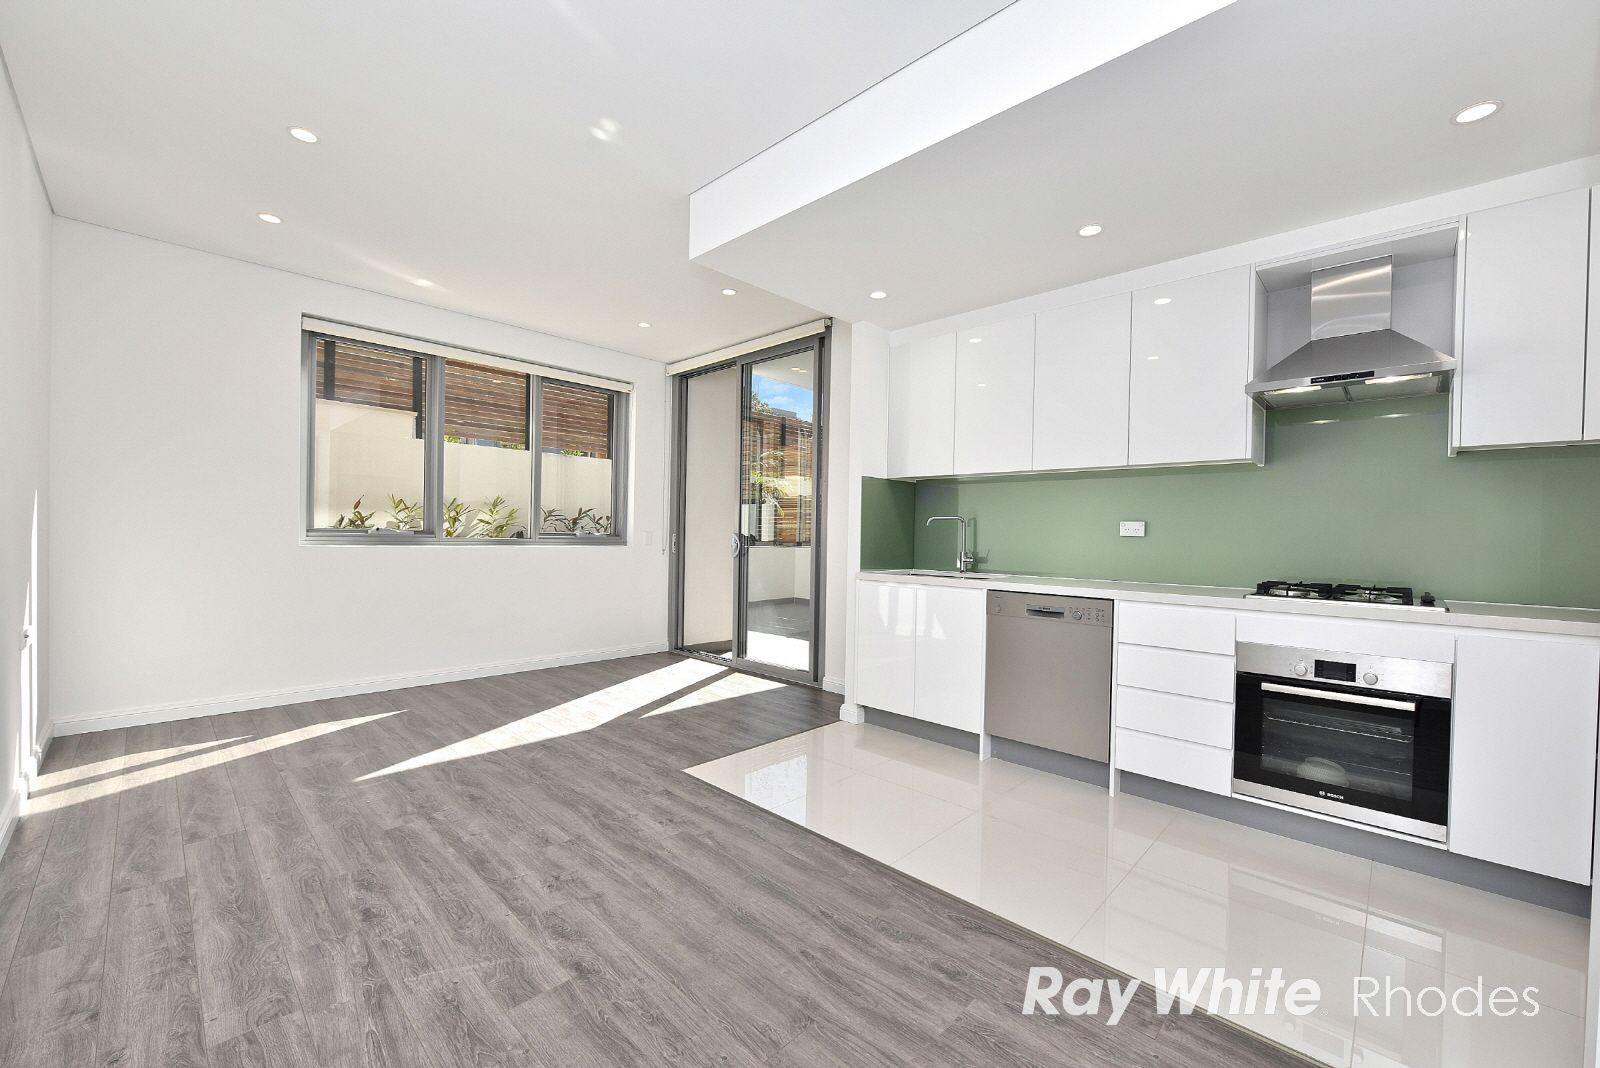 19/7 Porter St, Ryde NSW 2112, Image 0